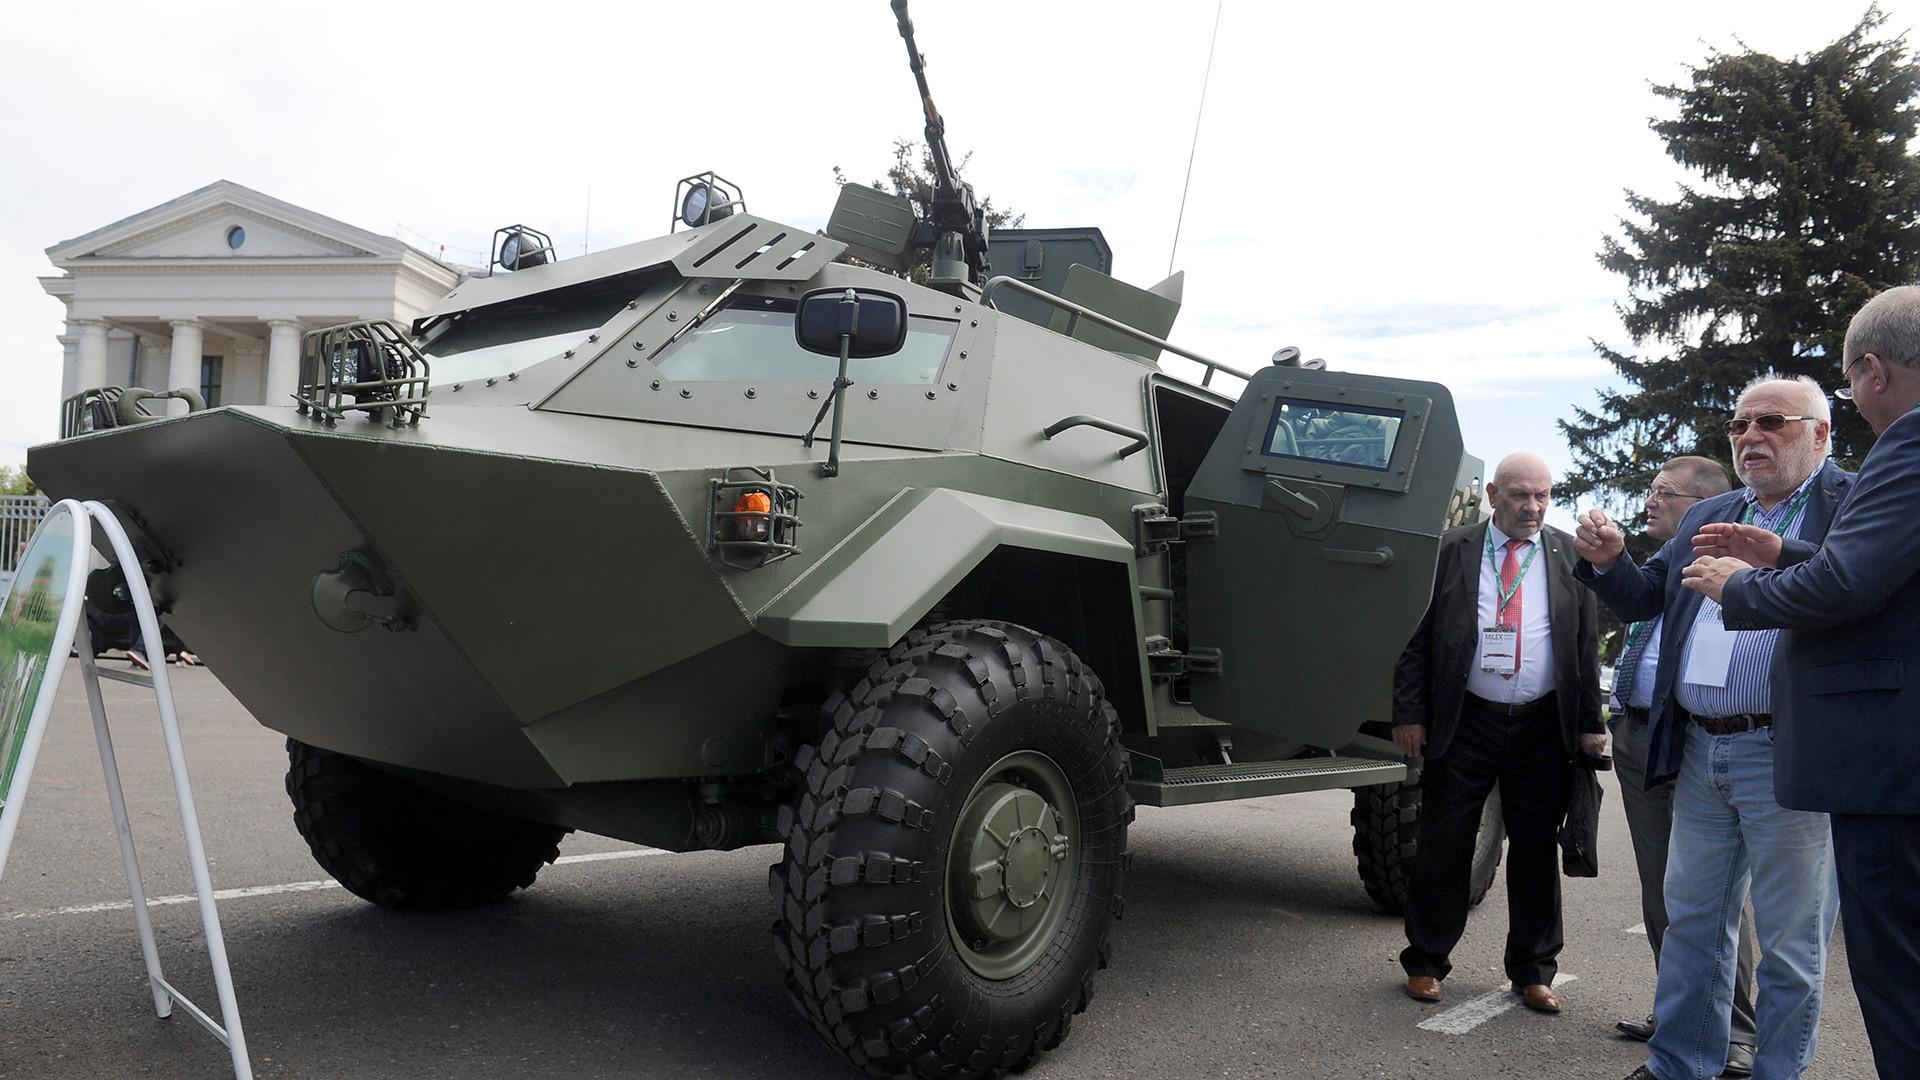 Modelo do blindado exposto em feira em Minsk